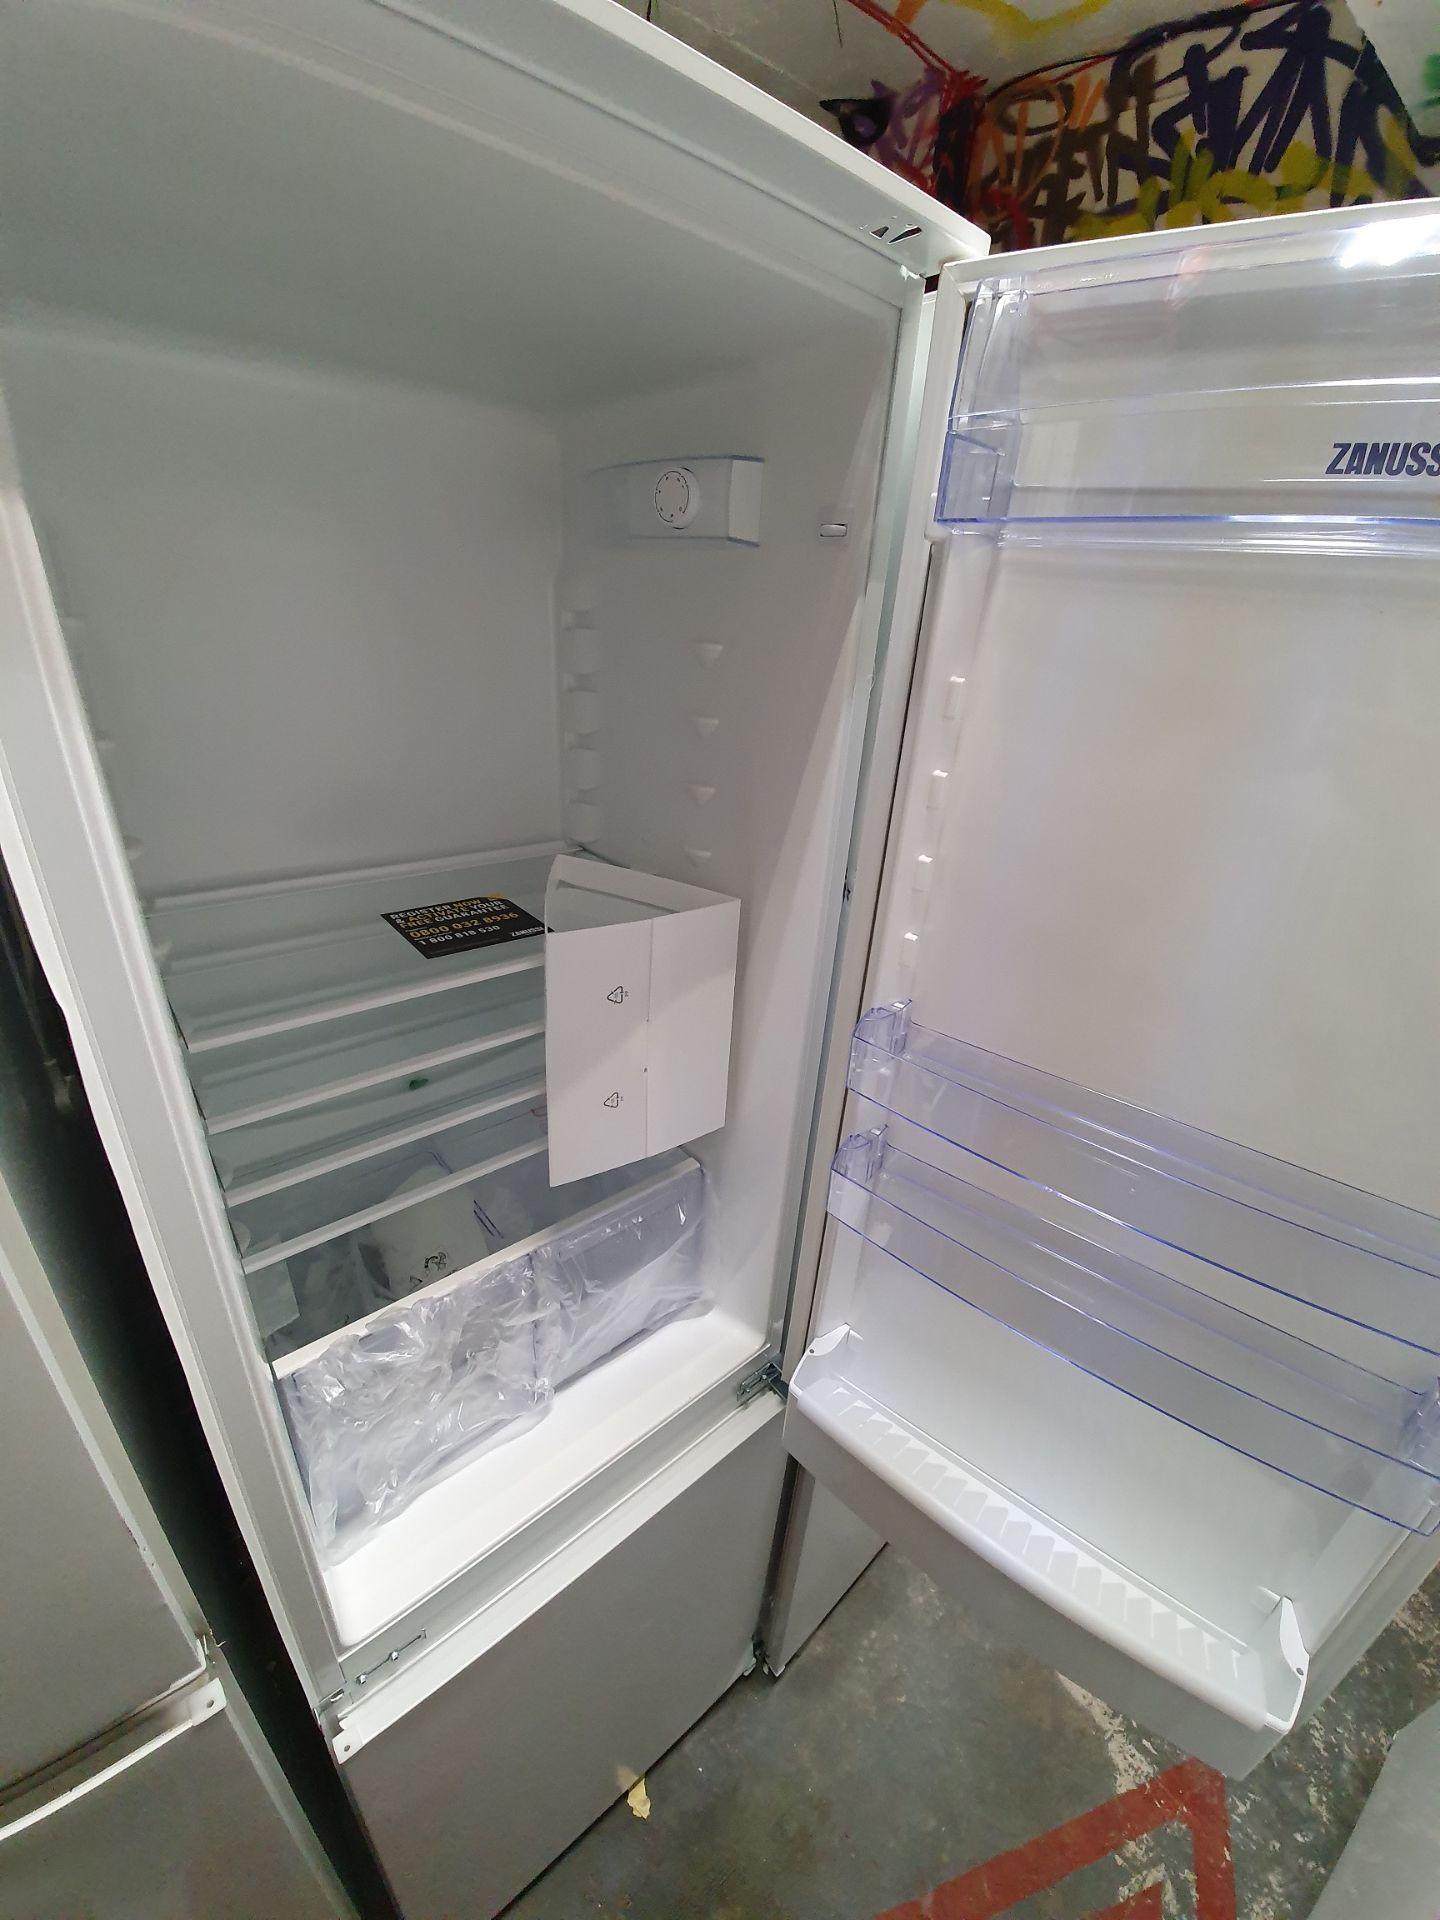 NEW/GRADED AND UNPACKAGED Zanussi ZBB28441SV Integrated 70/30 Fridge Freezer (Brand new slight - Image 5 of 14